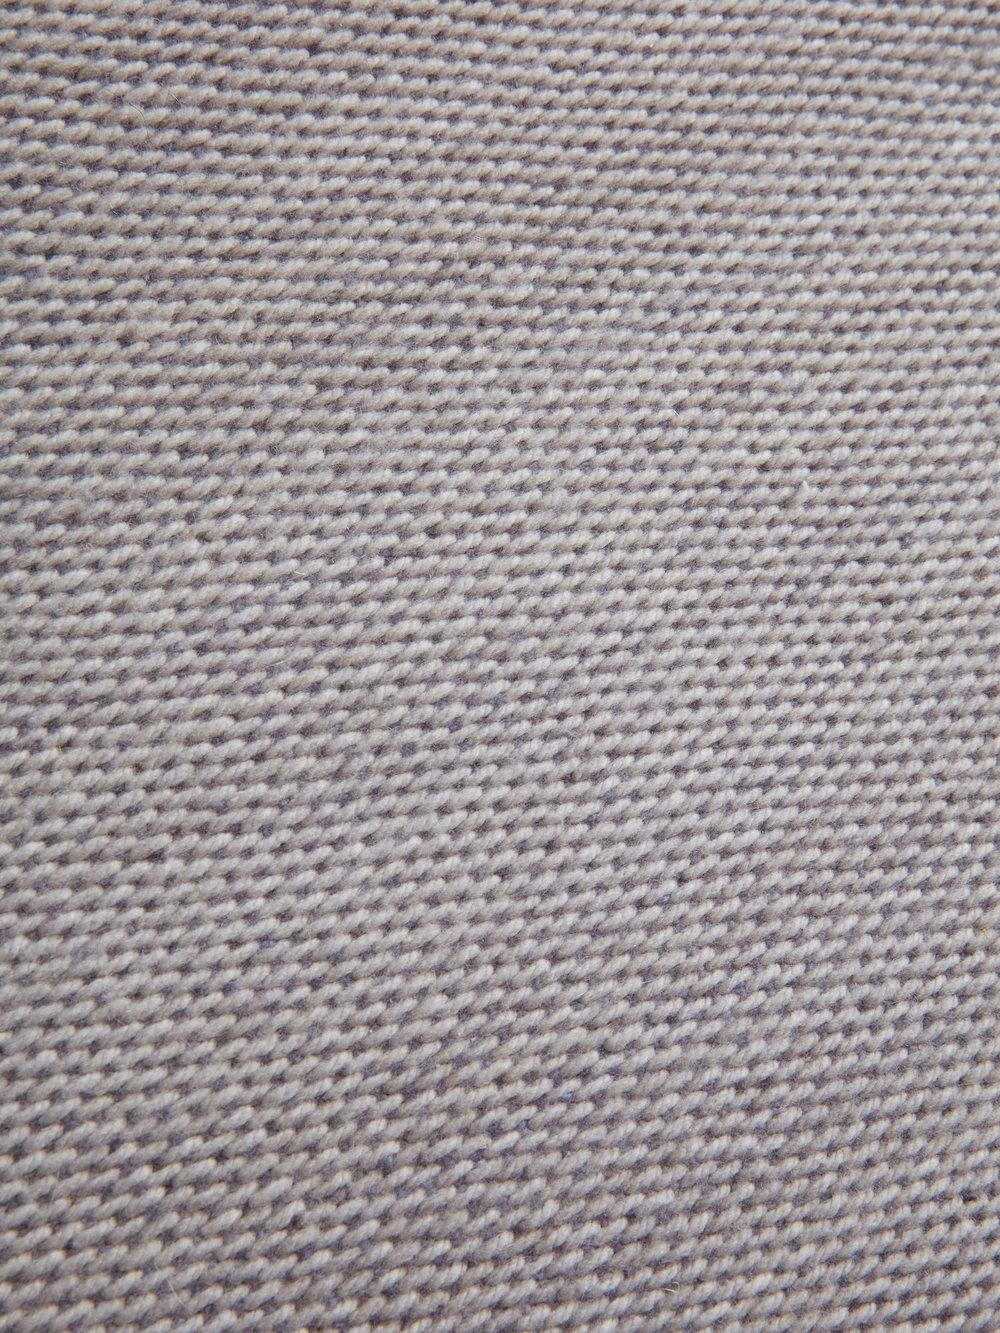 FELLS-ANDES-REN-RUG-DETAIL-MERINO-HI-RES-WHITE.jpeg